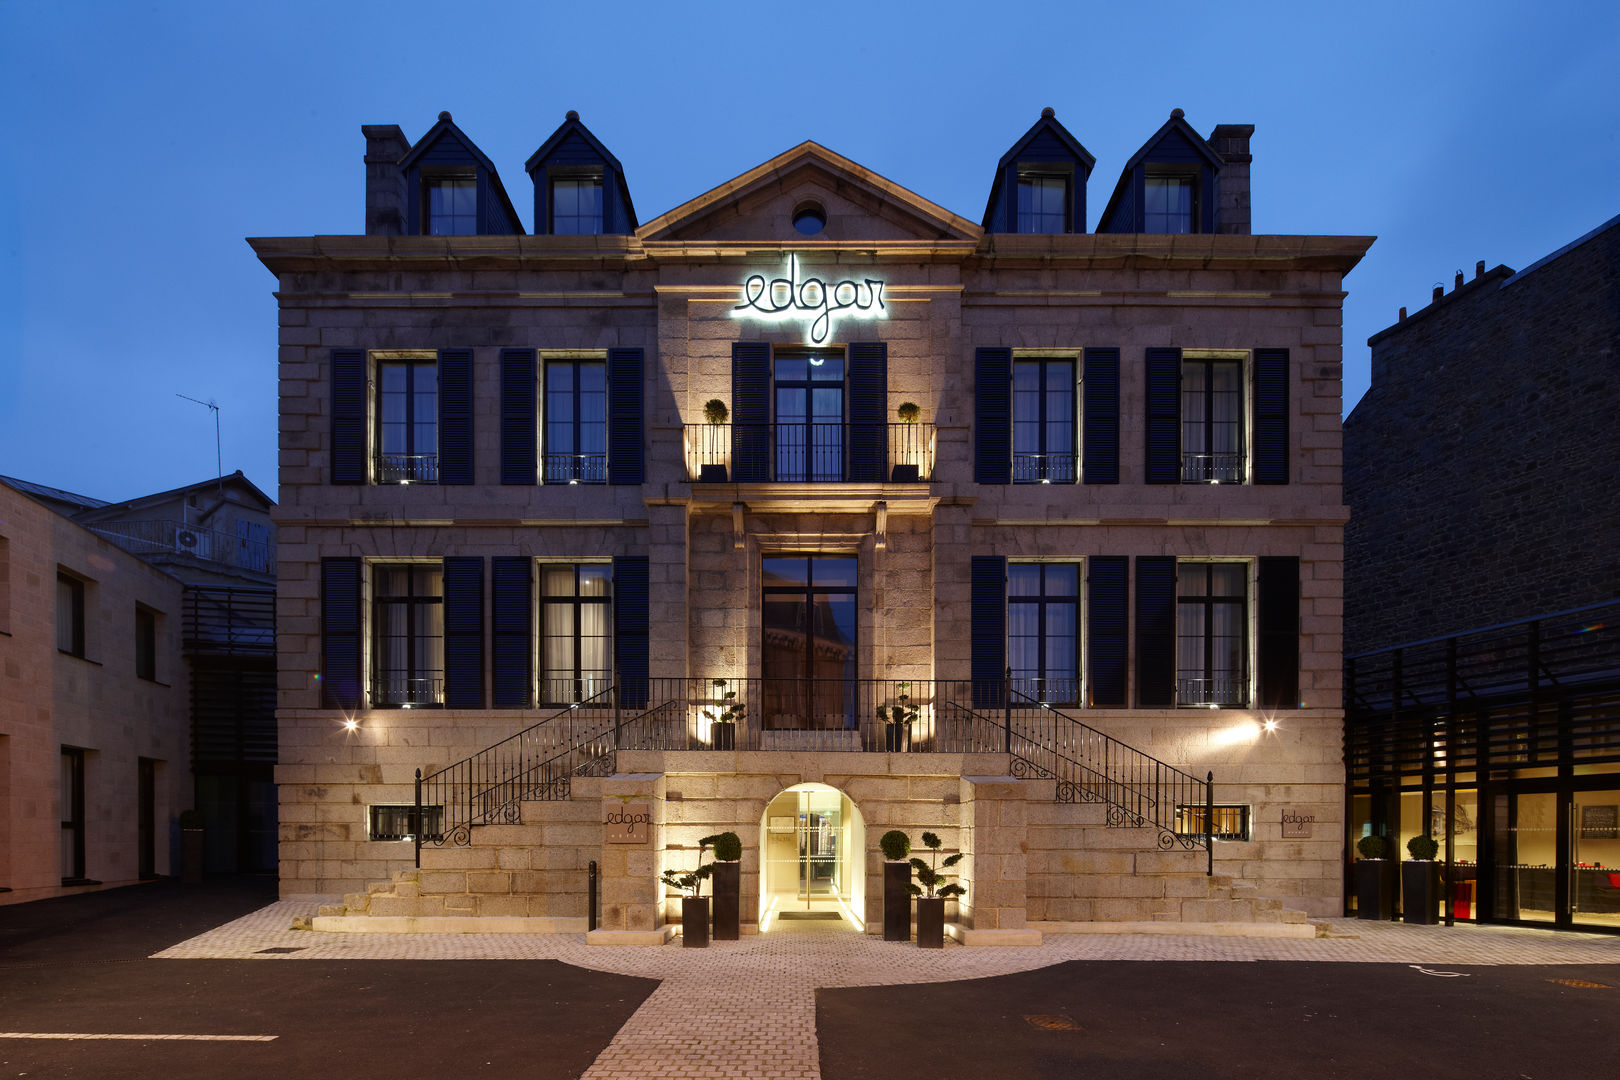 Hôtel_restaurant_Edgar_saint-brieuc_photo_principale